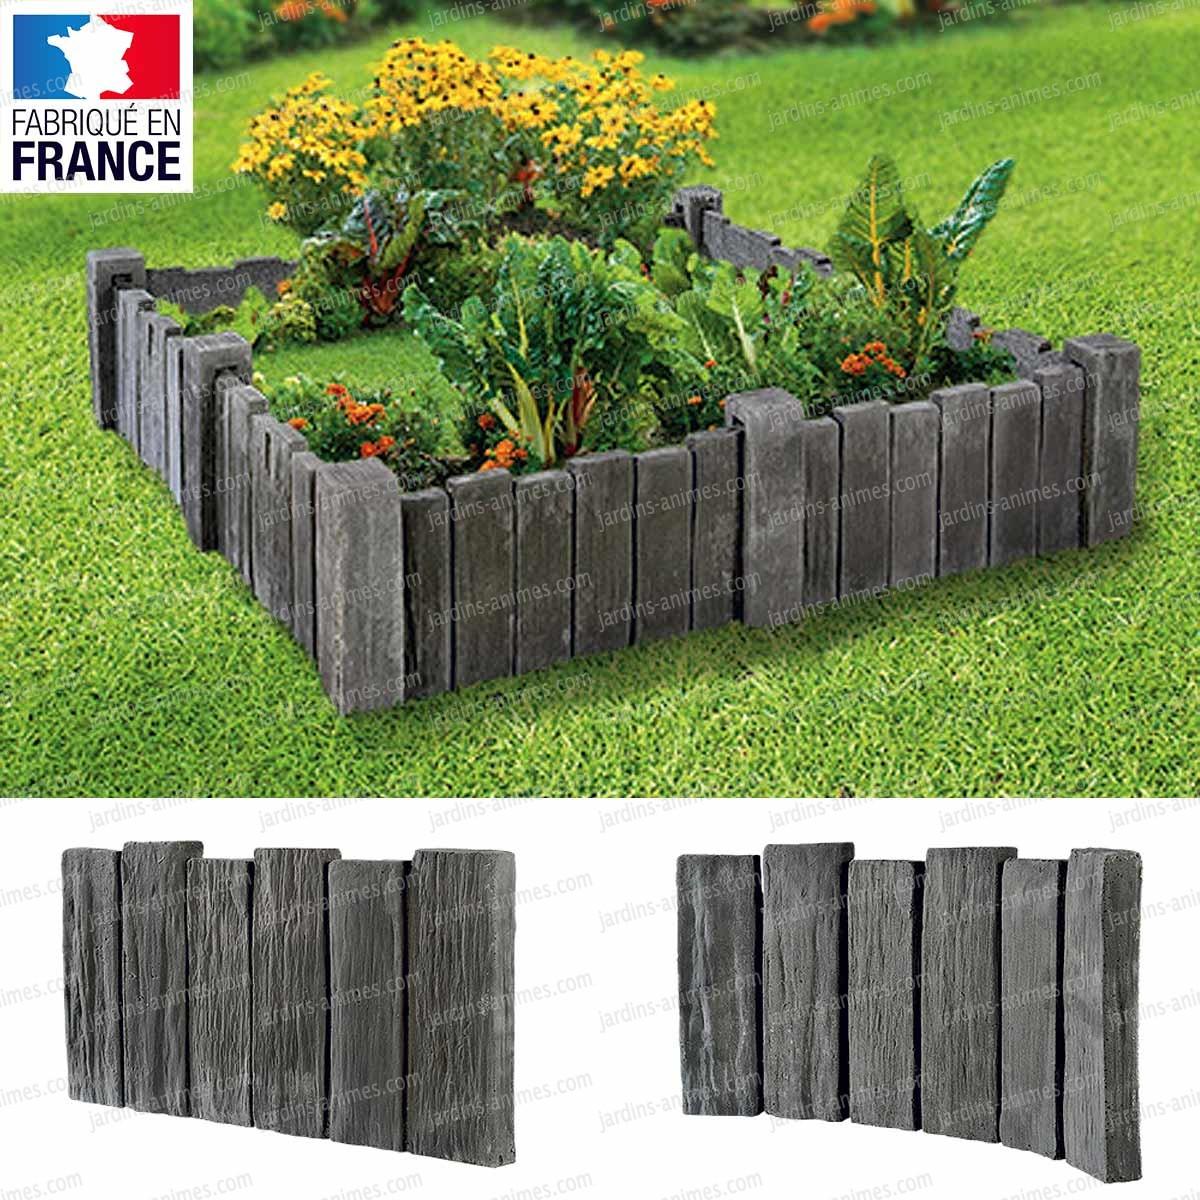 bordure imitation ardoise piquet ardoise pas cher nouveau bordure aluminium jardin leroy. Black Bedroom Furniture Sets. Home Design Ideas